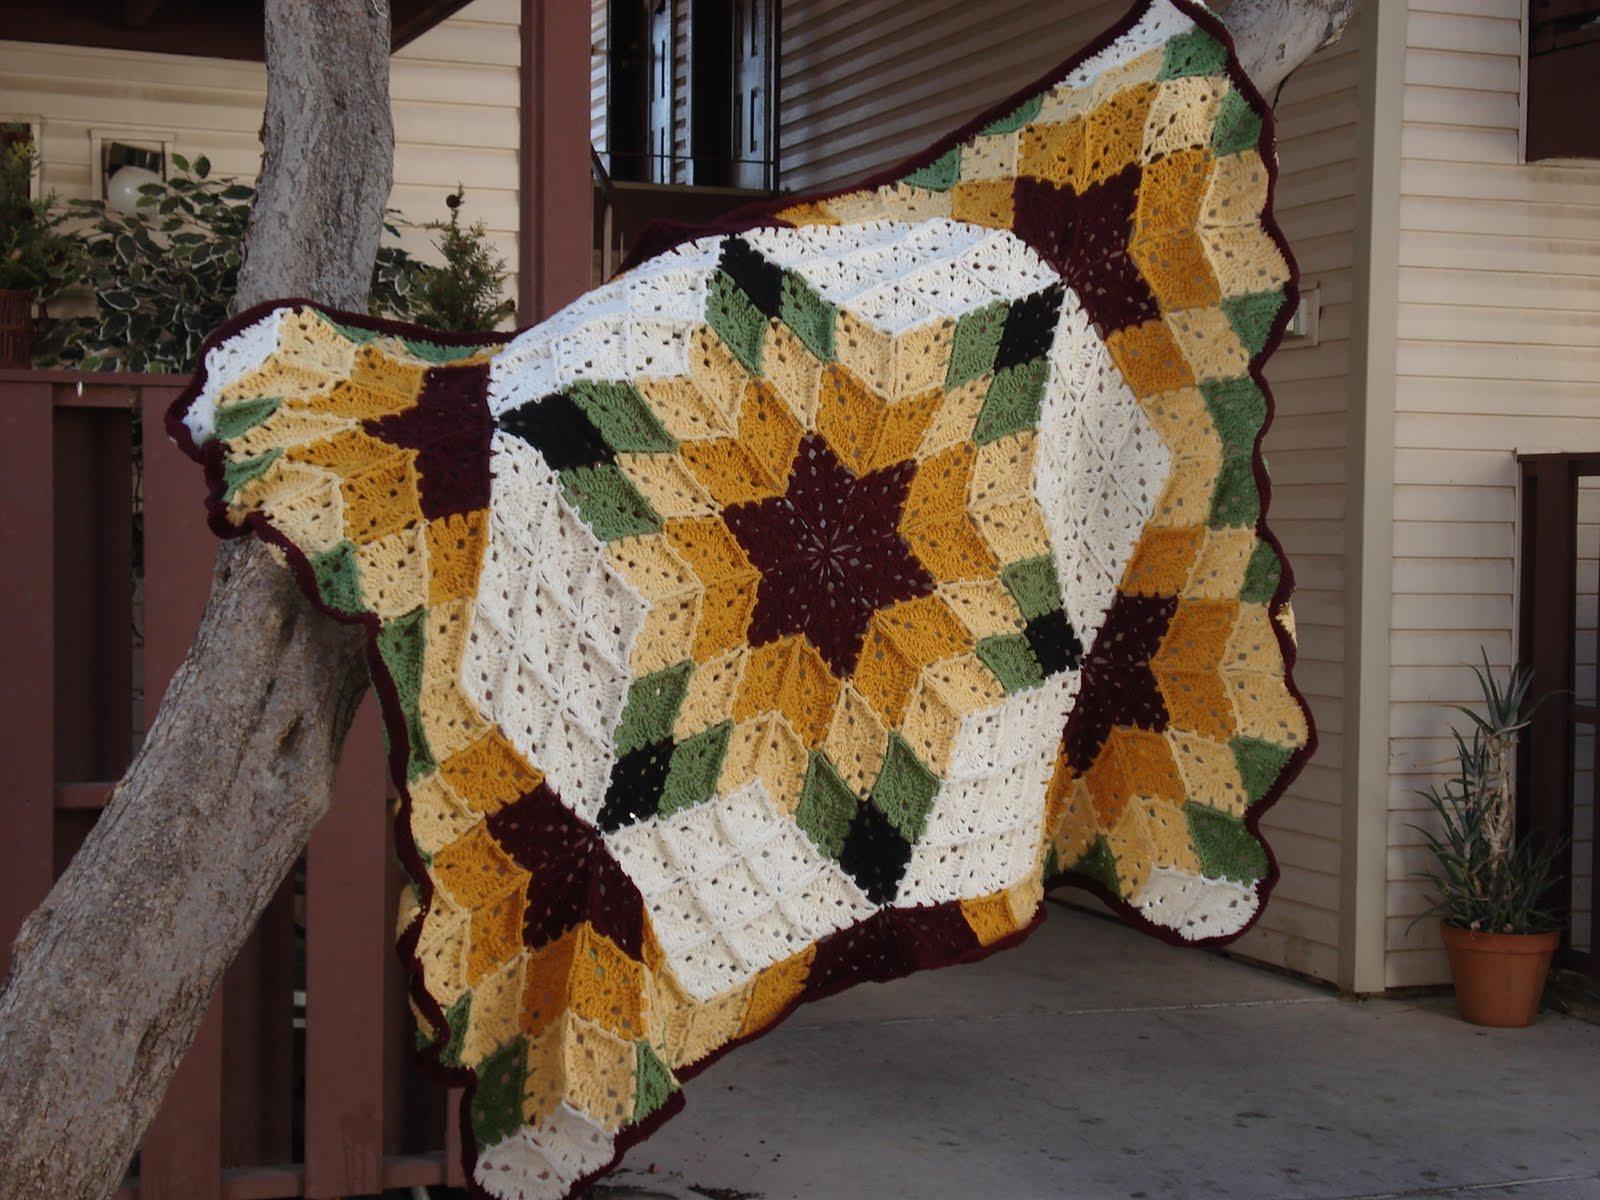 Crochet Afghan Patterns Quilt : Crochet on Pinterest Afghans, Free Crochet and Crochet ...